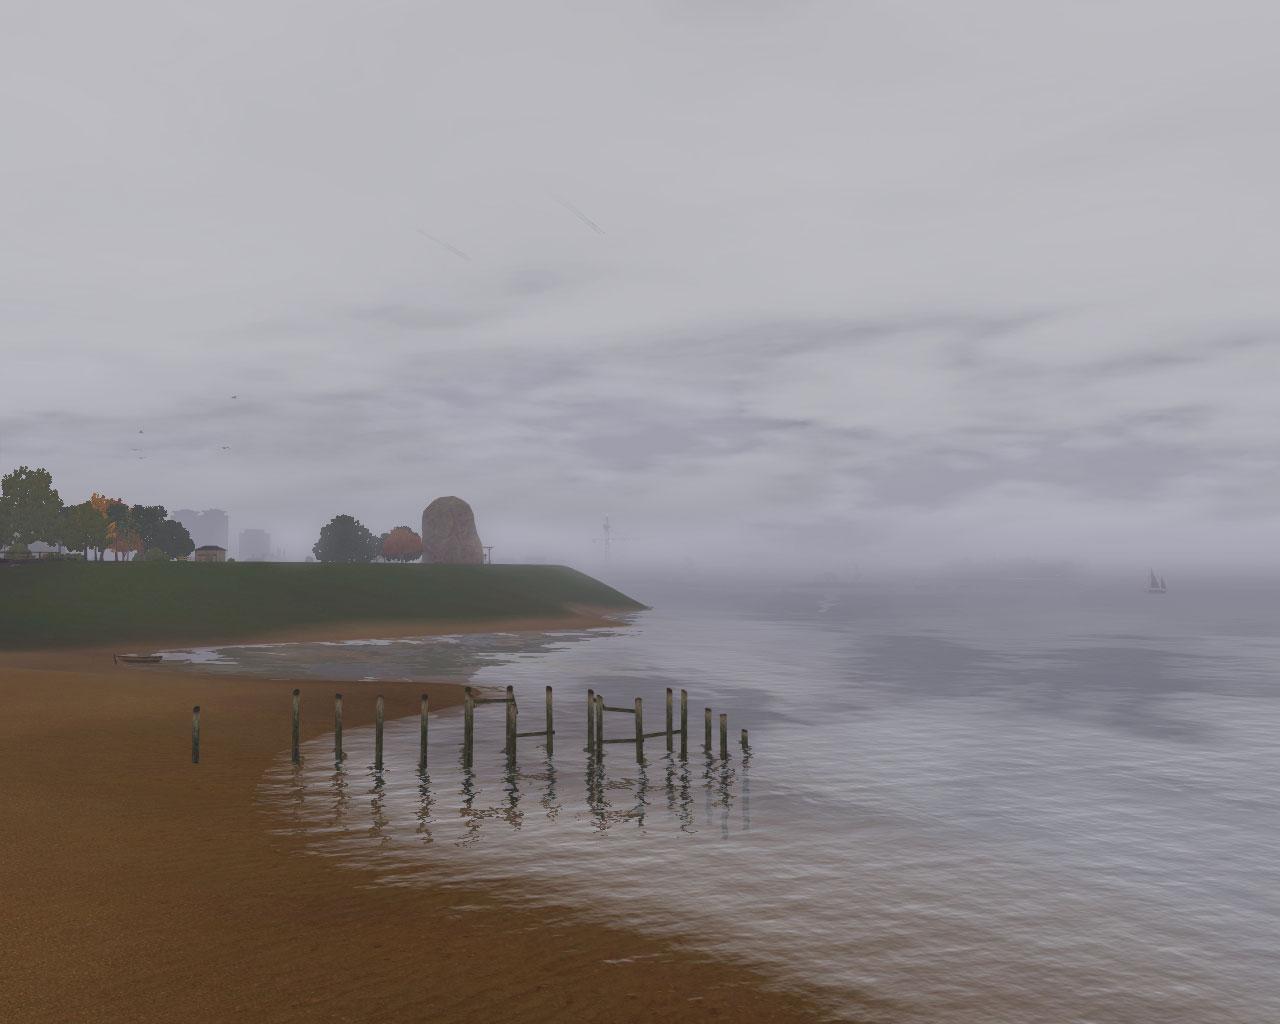 MTS_simsample-1320337-Mist-Indigo-Beach.jpg